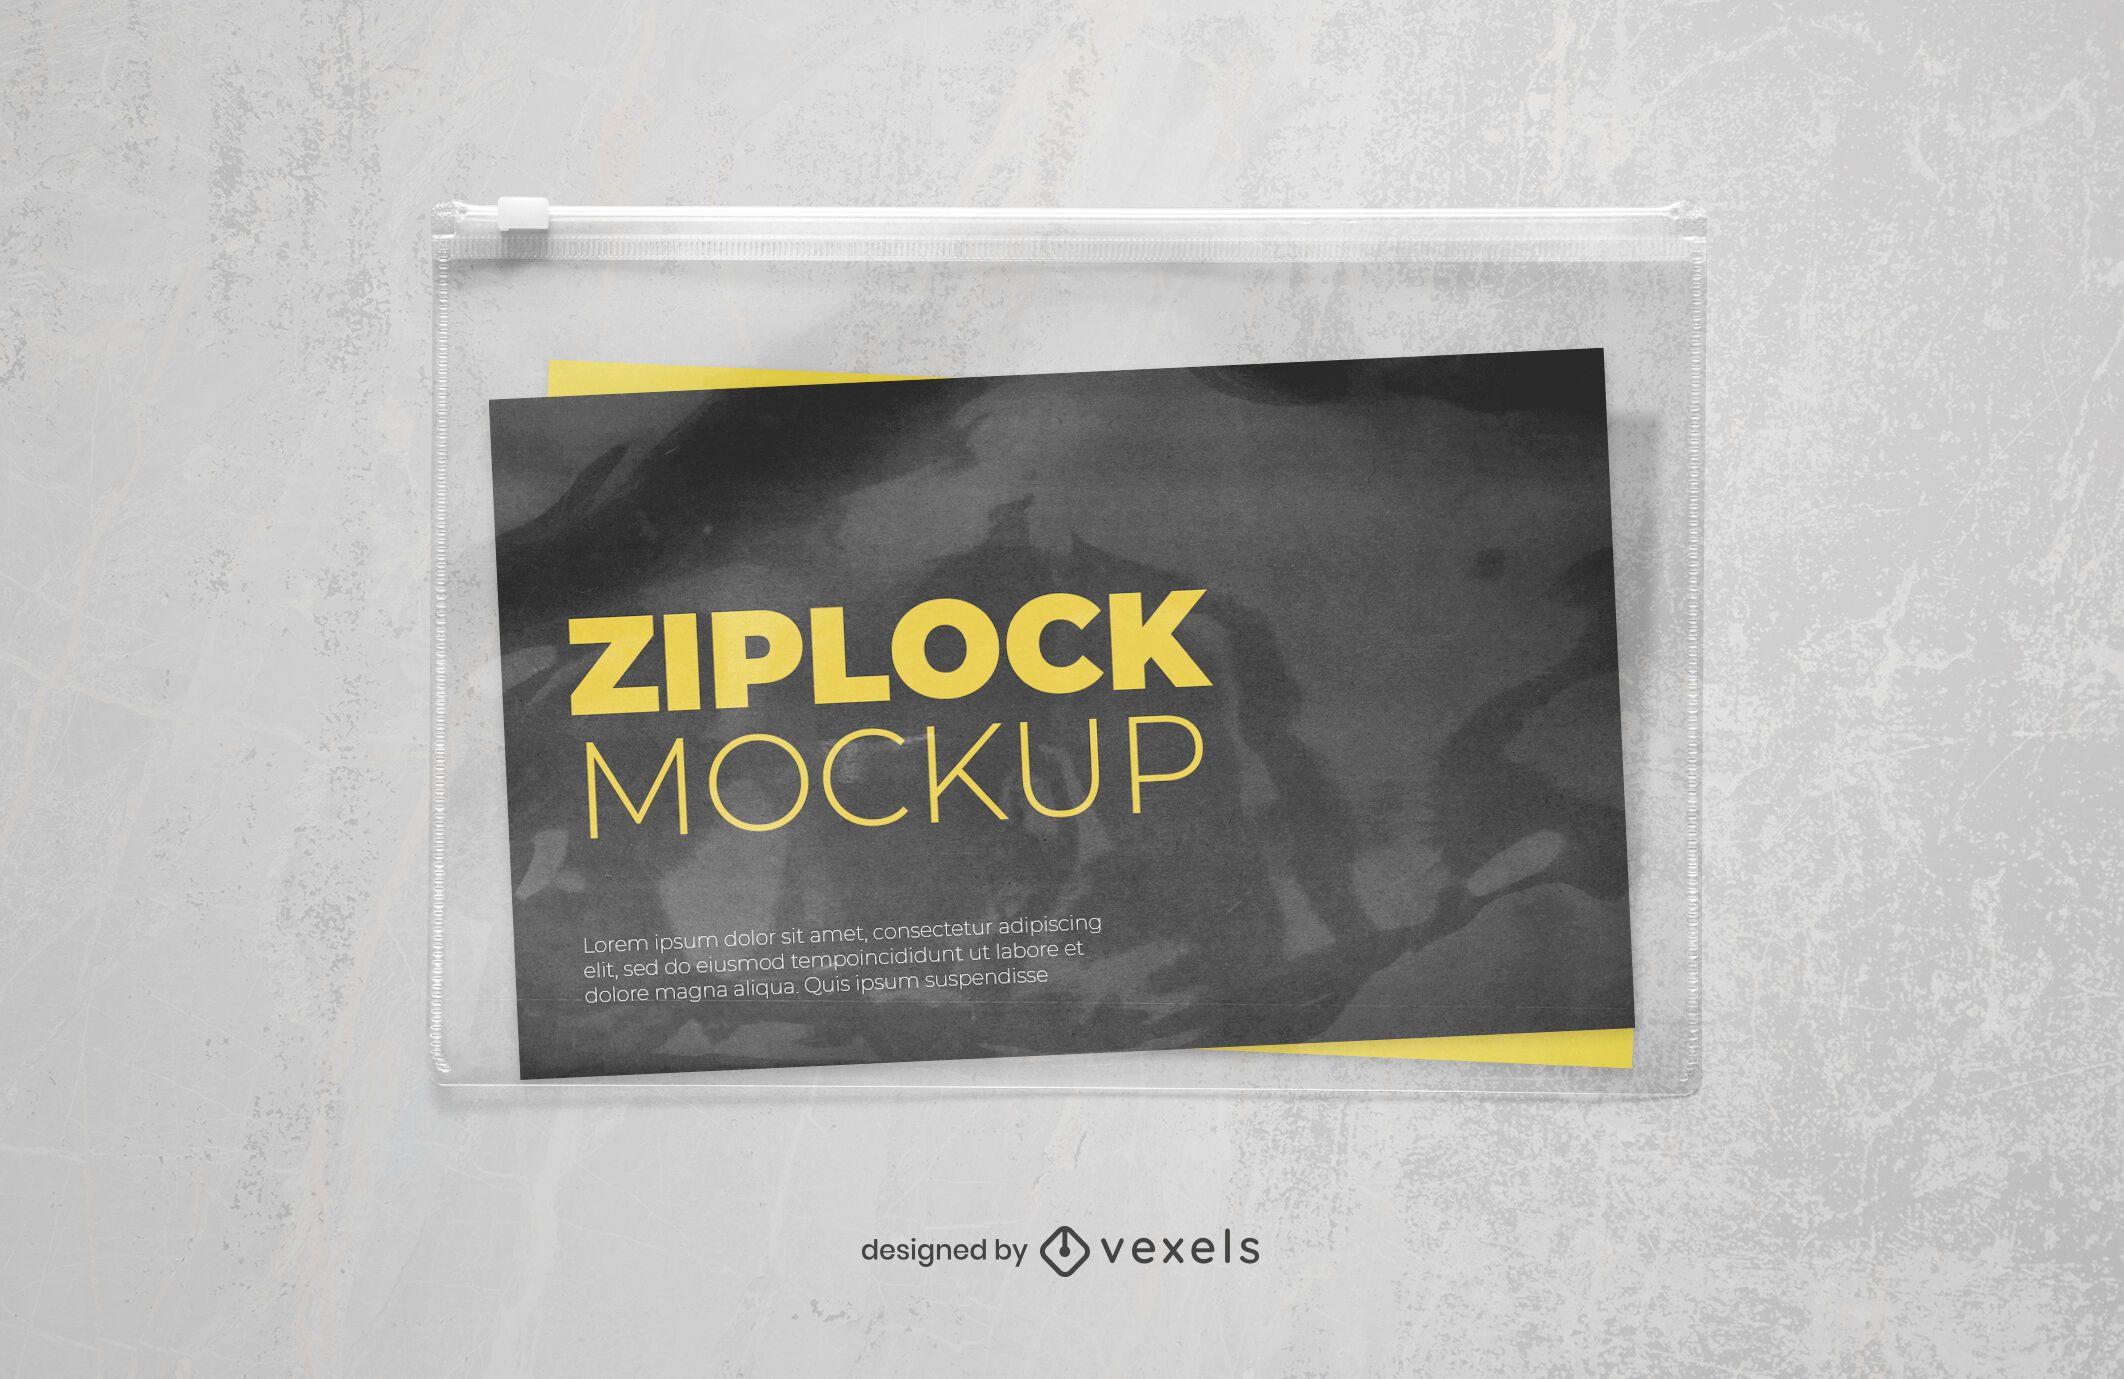 plastic ziplock mockup design